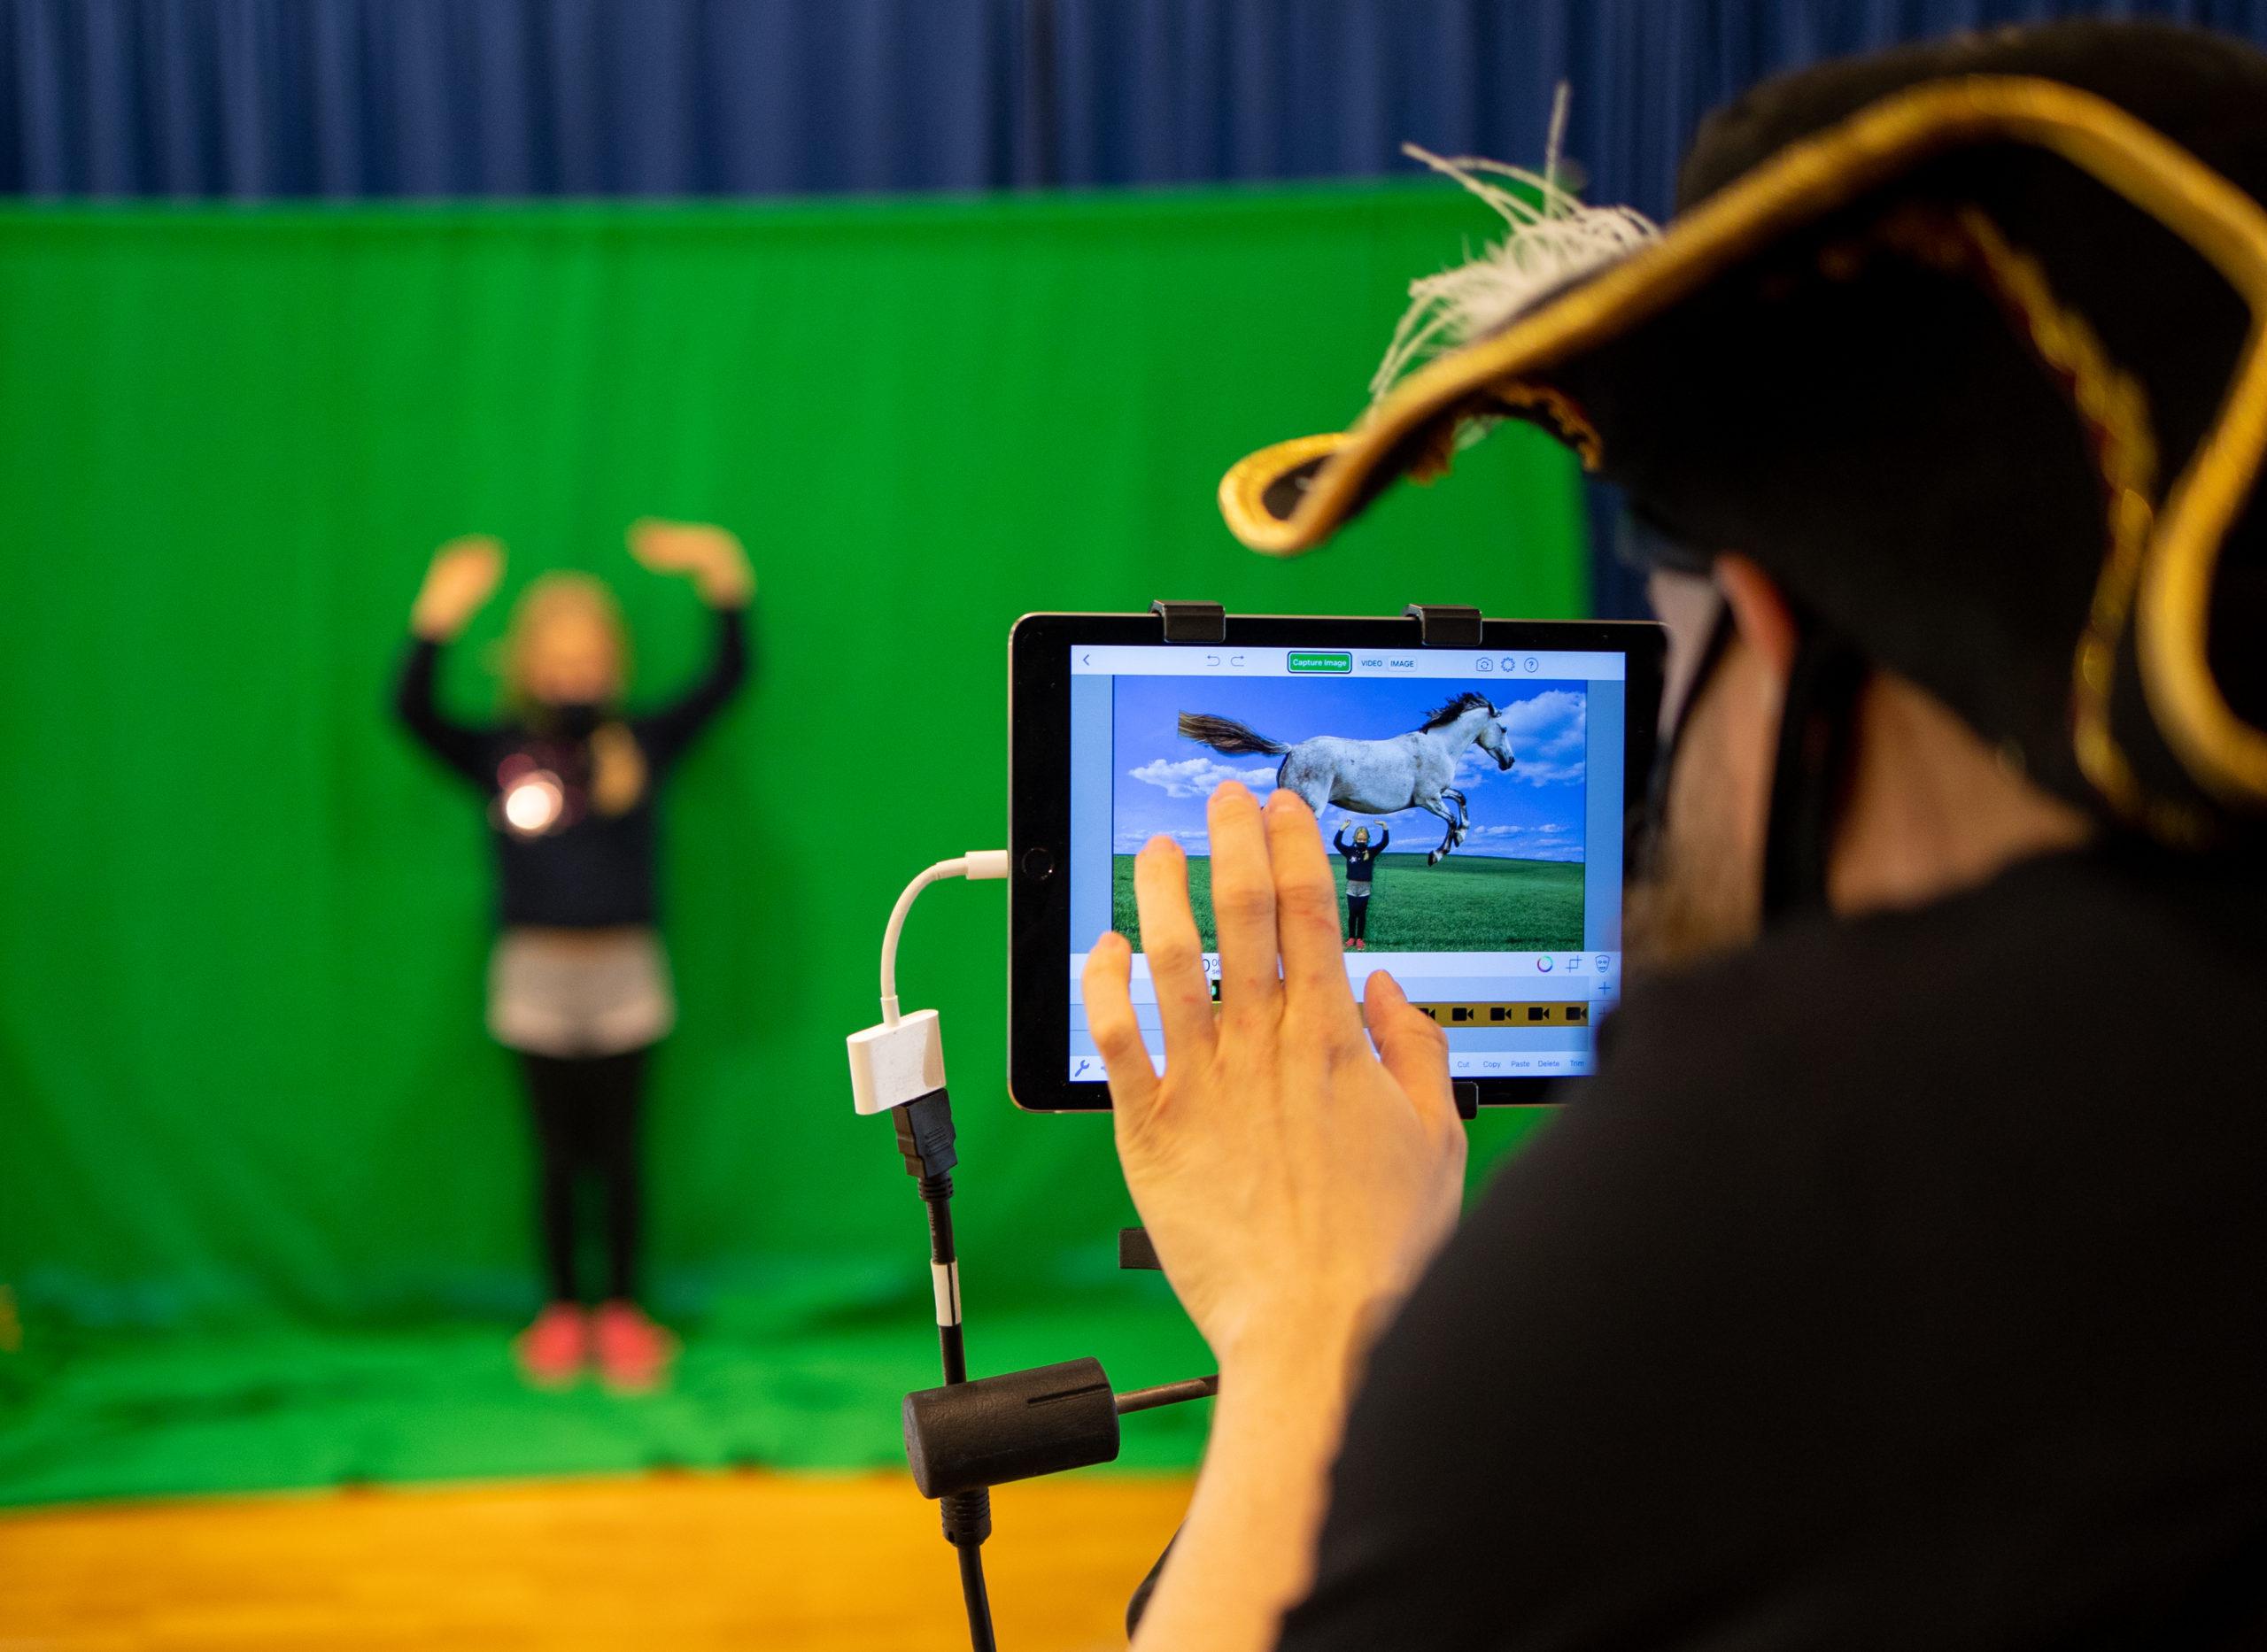 Pippi auf dem Green-Screen